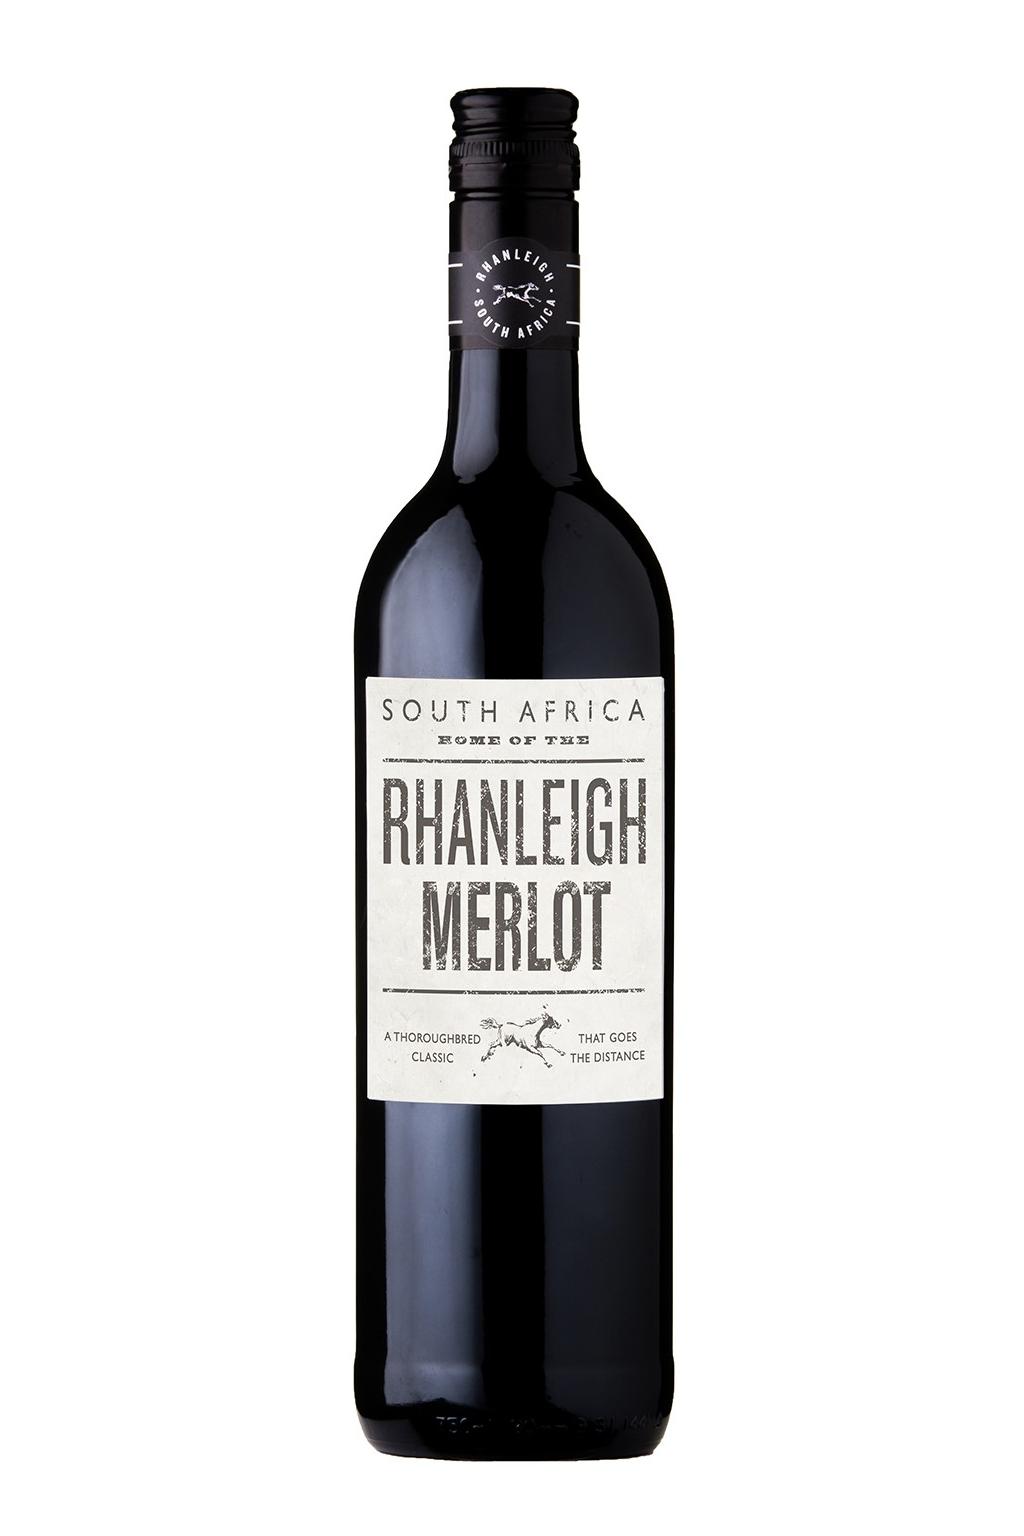 Rhanleigh Merlot web